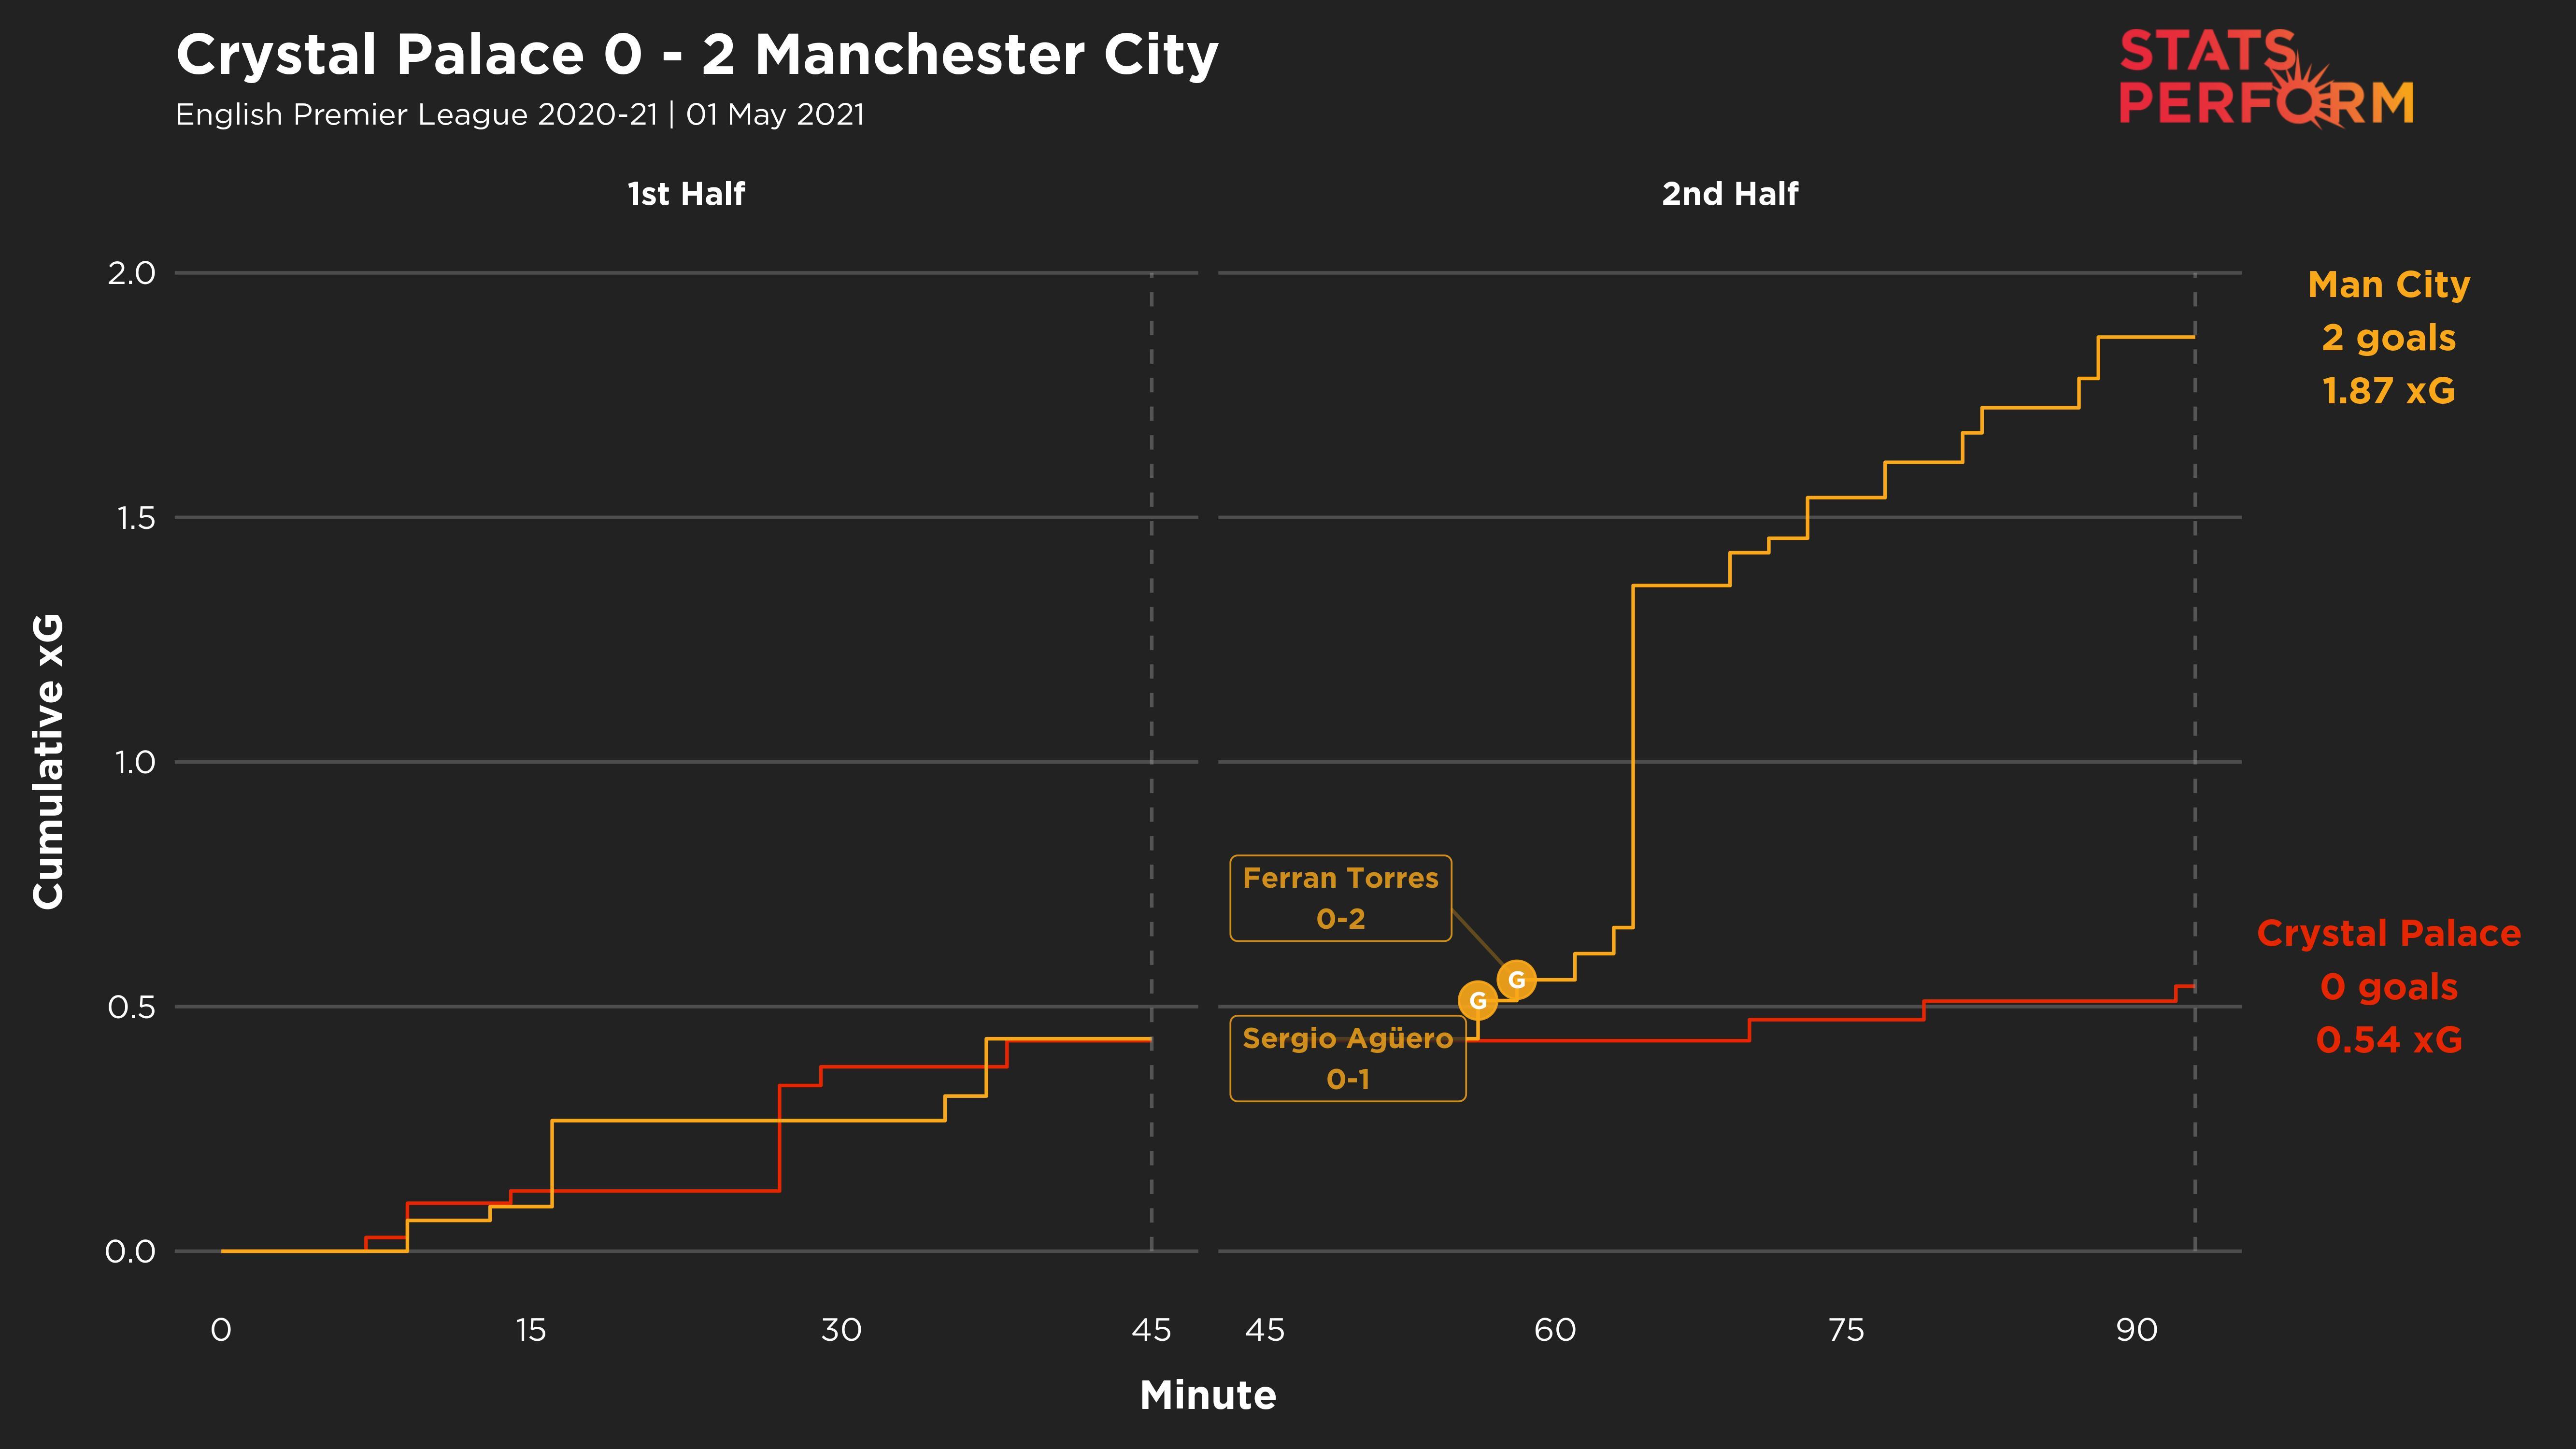 Crystal Palace 0-2 Man City